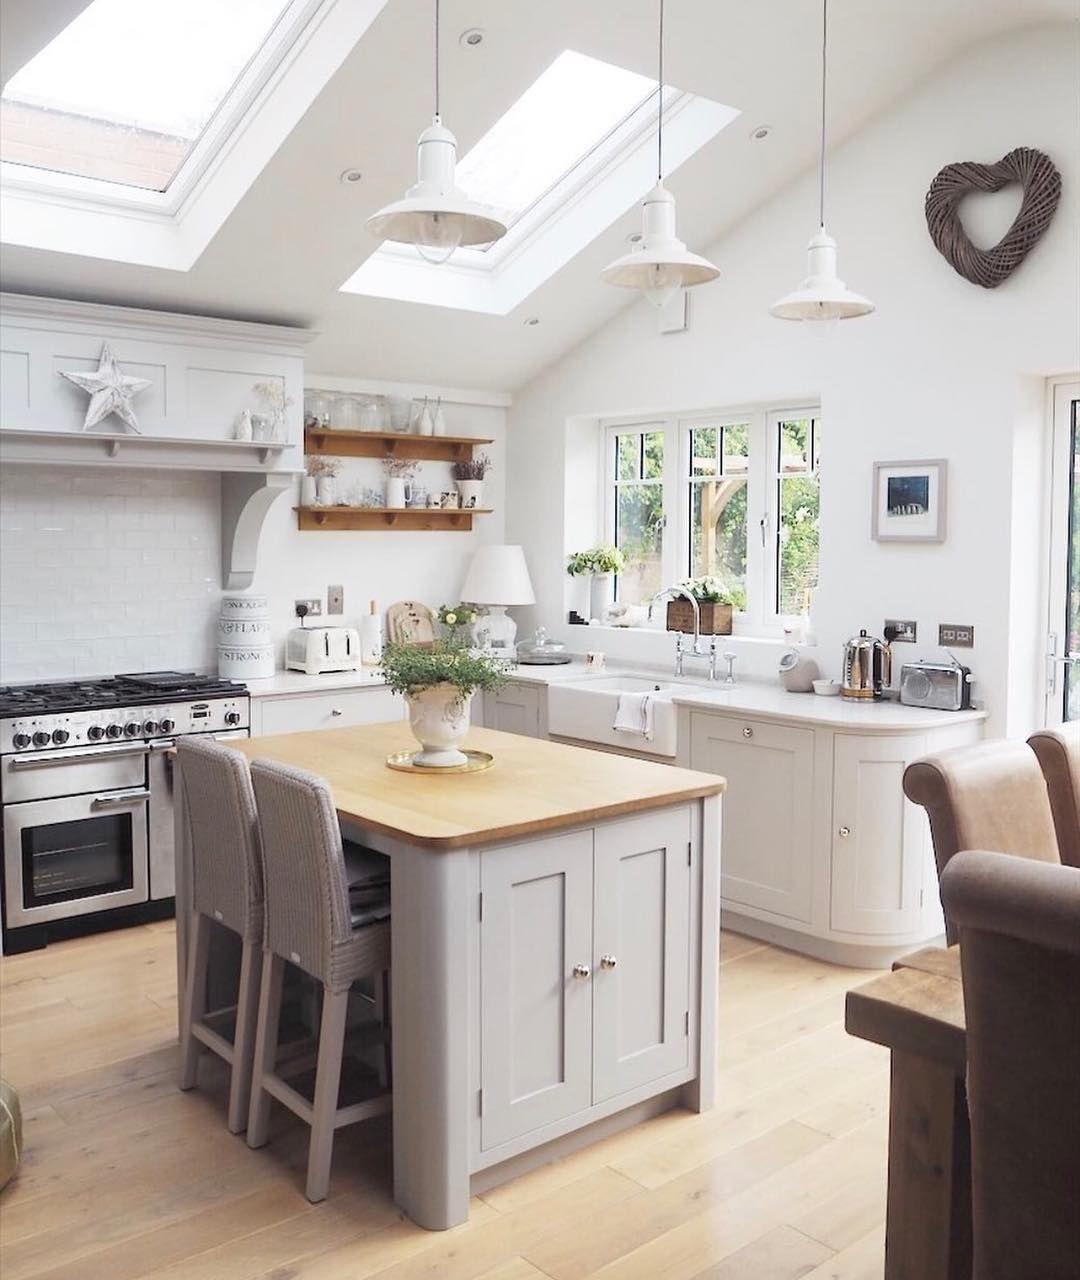 12 Inspiring Kitchen Island Ideas: Design Ideas Modern And Traditional Small Kitchen Island